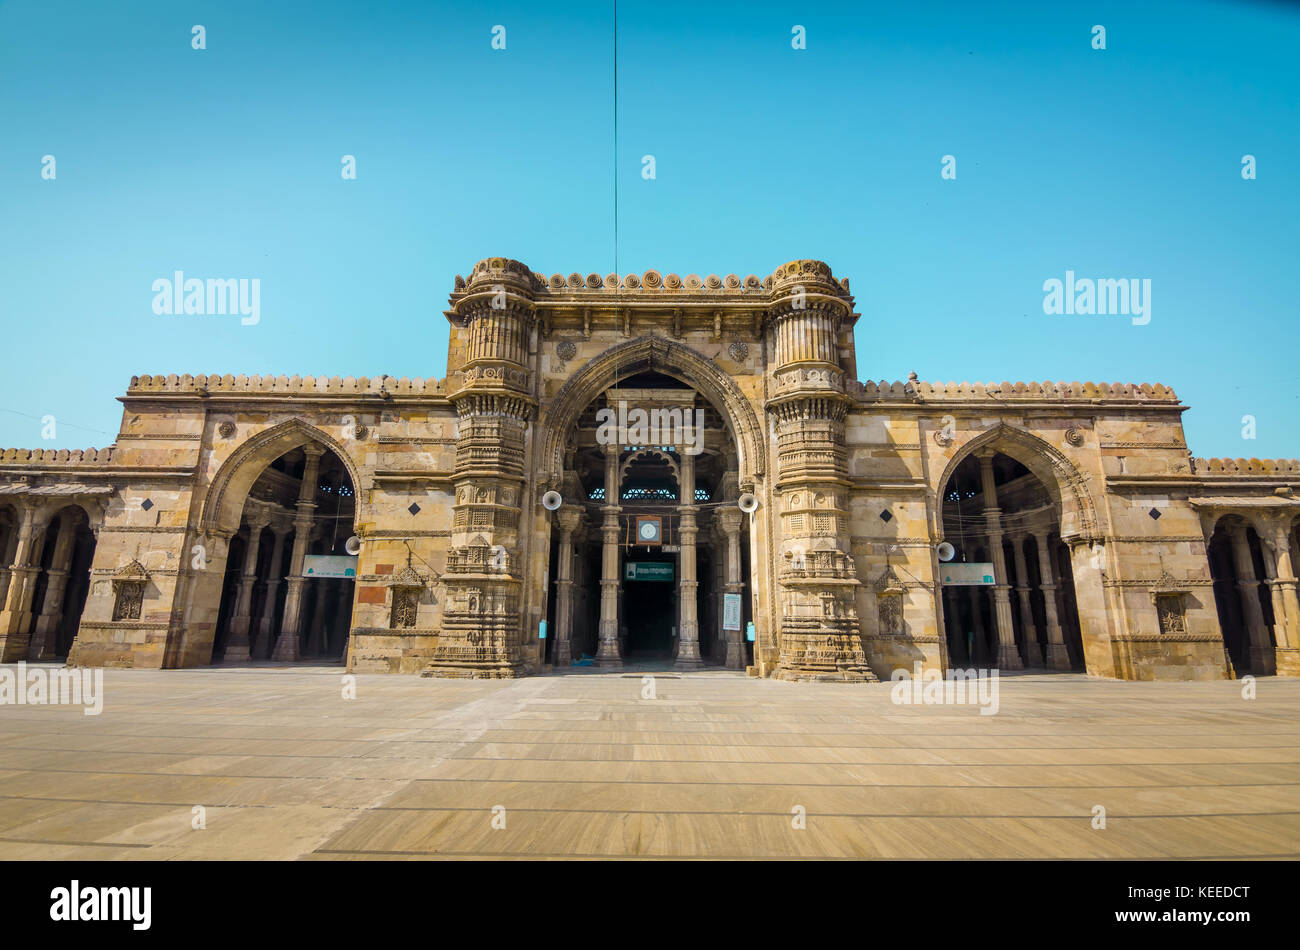 AHMEDABAD, INDIA - NOVEMBER 27, 2016: Jama Mosque or Juma Masjid, an ancient islamic architecture in heritage city - Stock Image